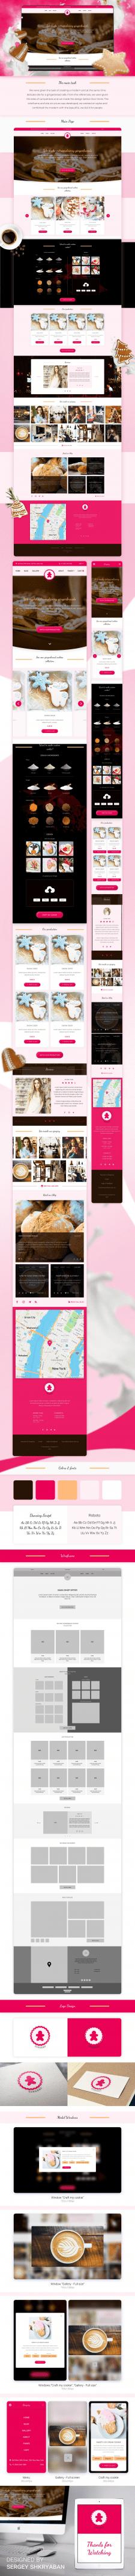 Gingery - Website Design